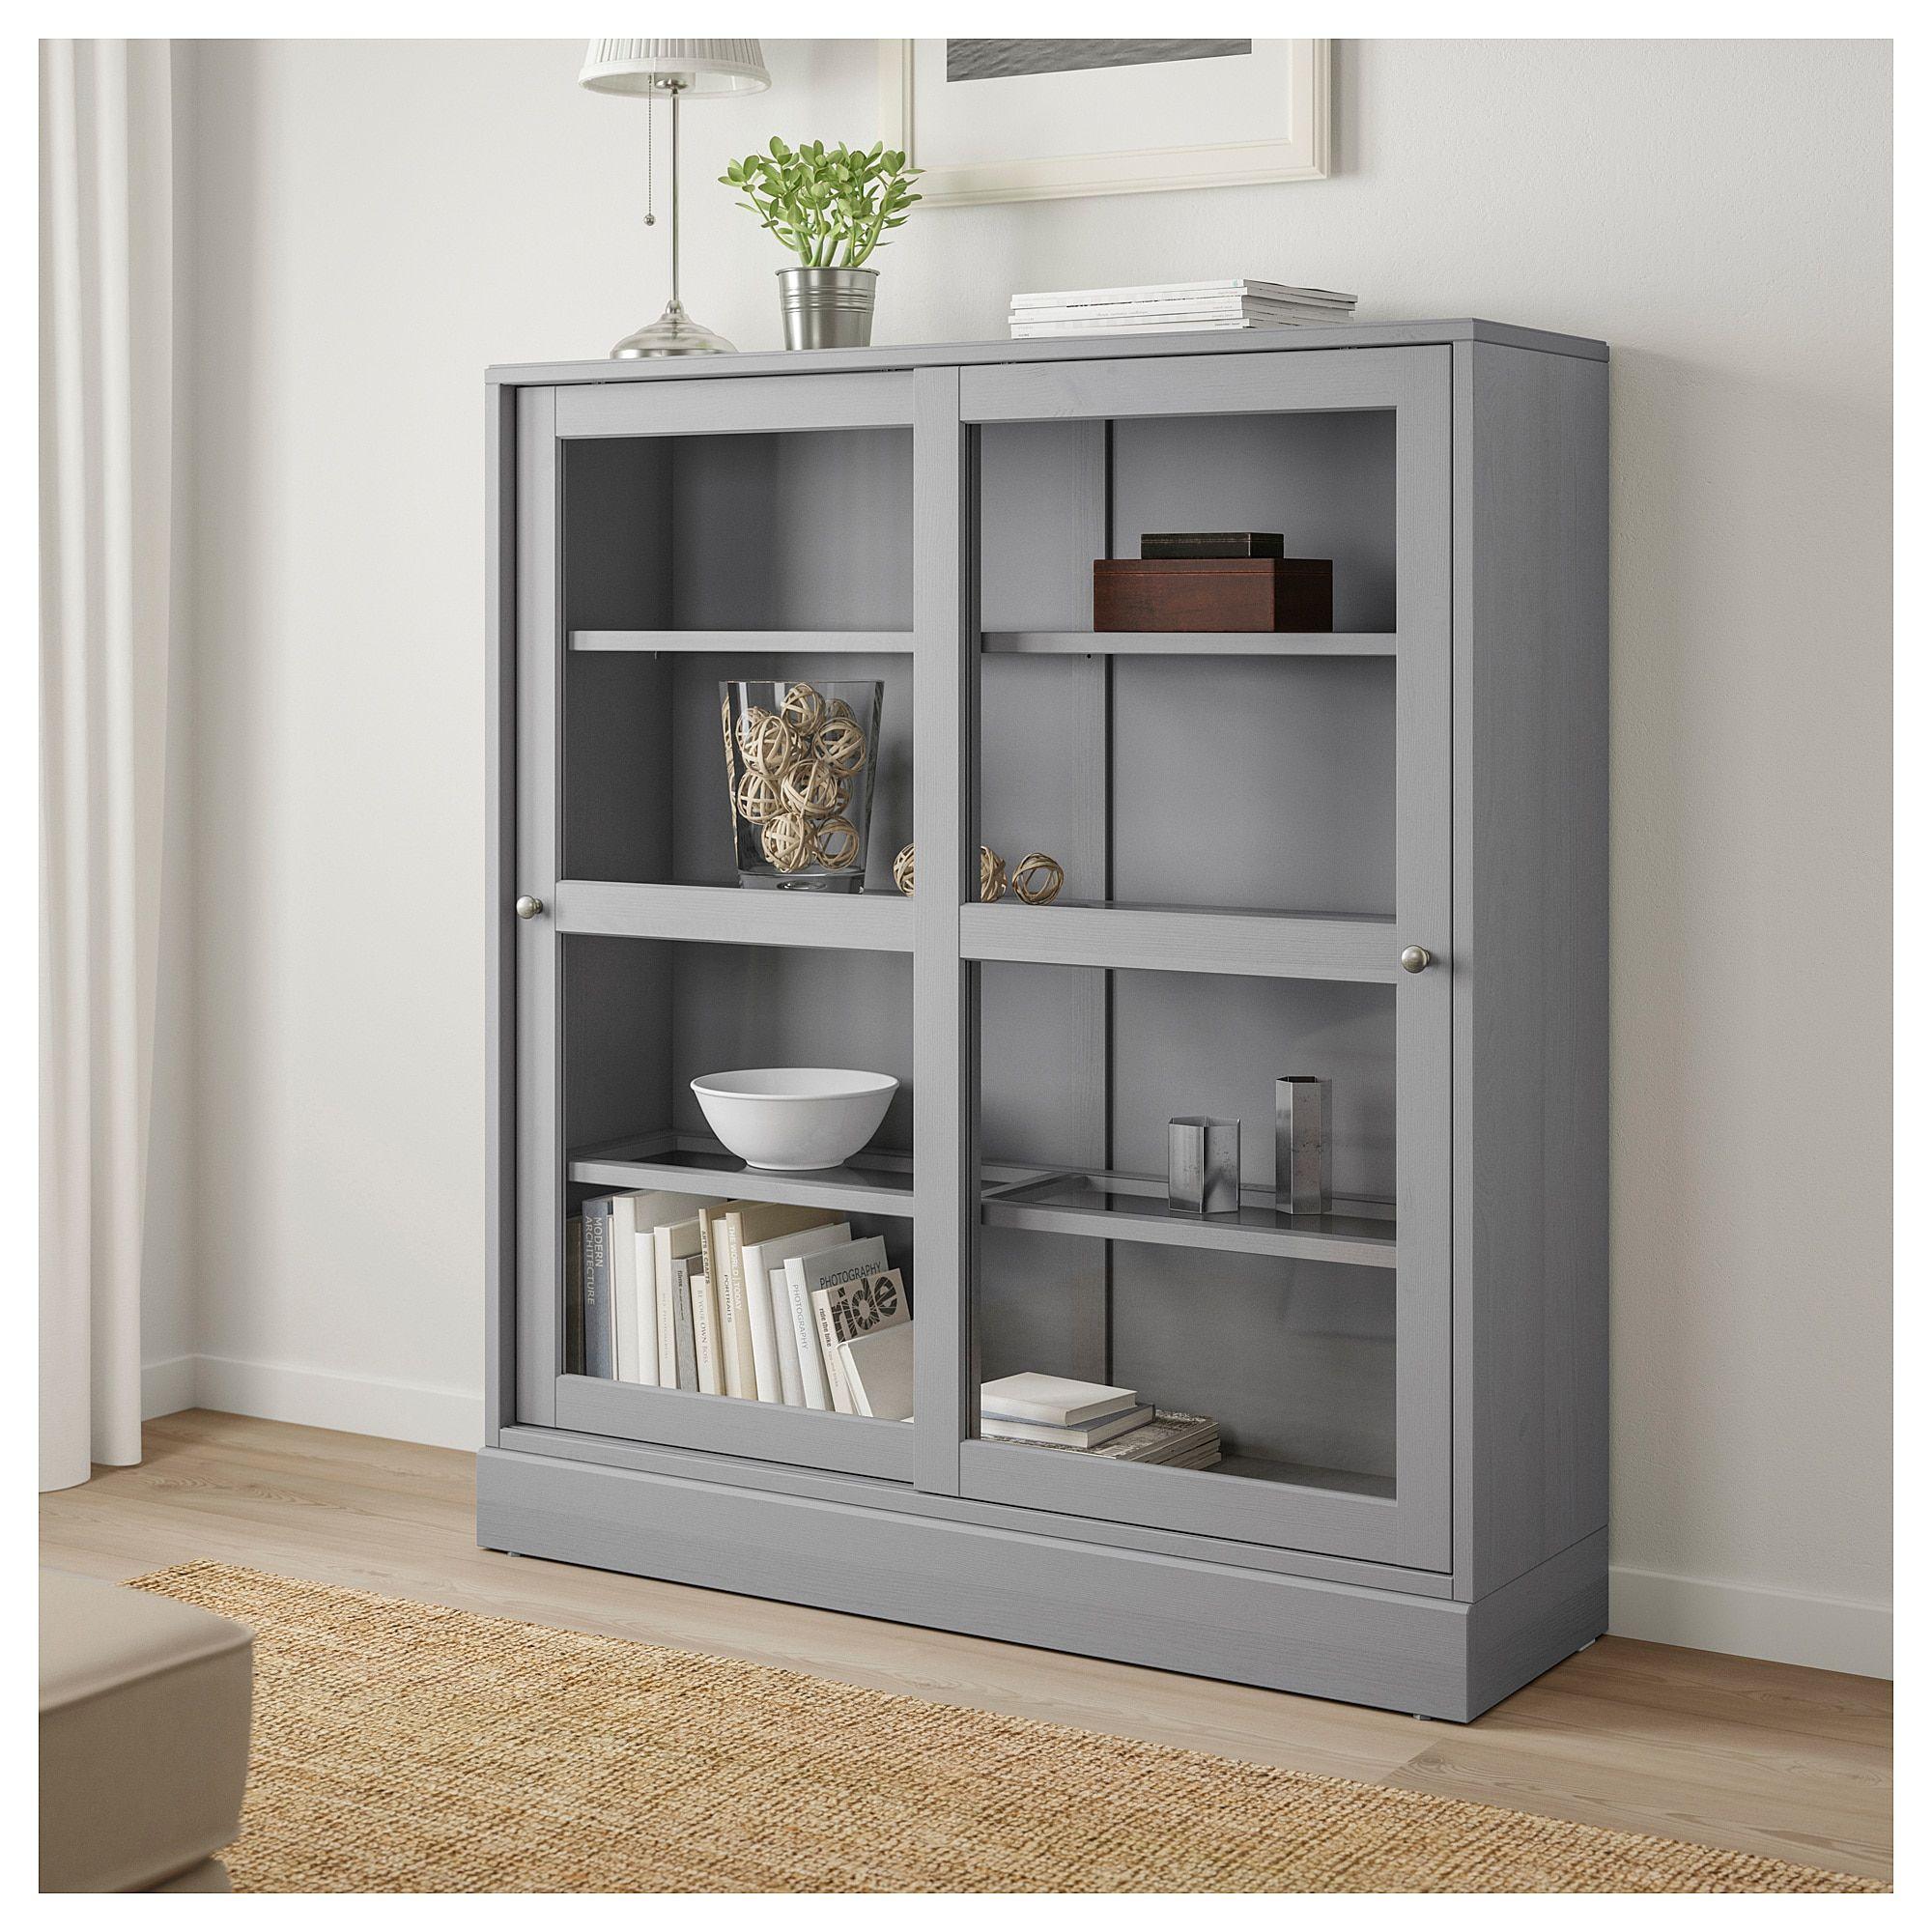 IKEA HAVSTA Glassdoor with base gray, clear